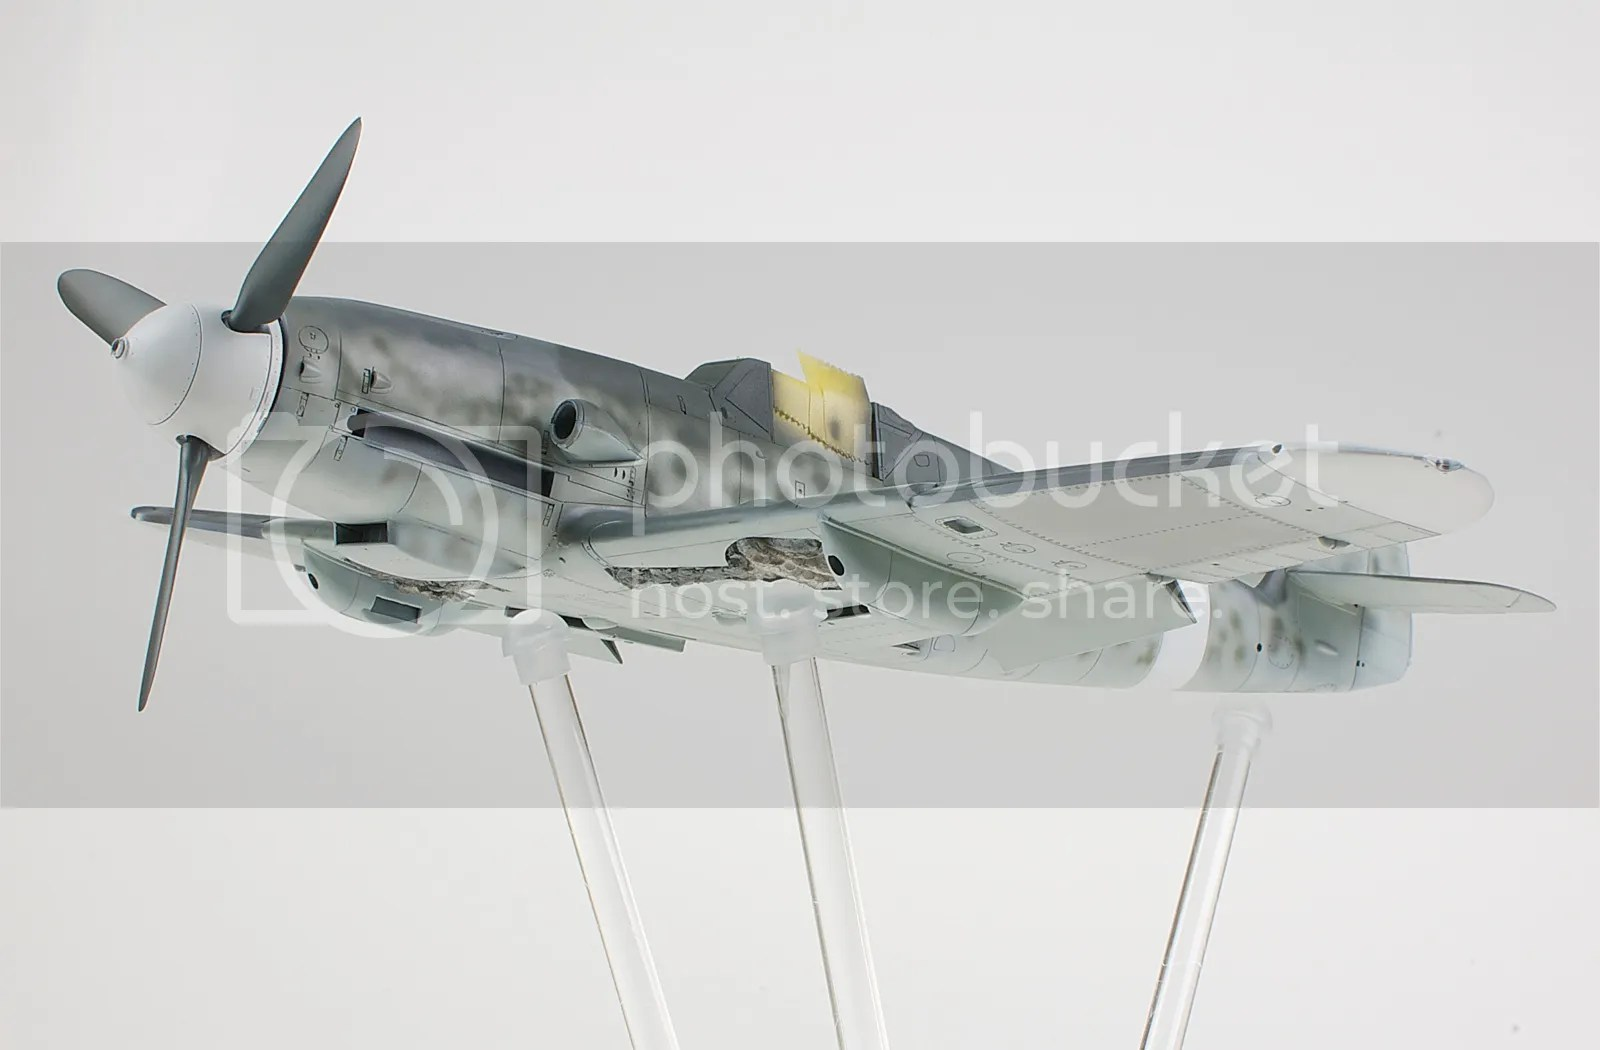 Bf 109G-4 08-23-2013 1 photo file_zps9c387b33.jpg